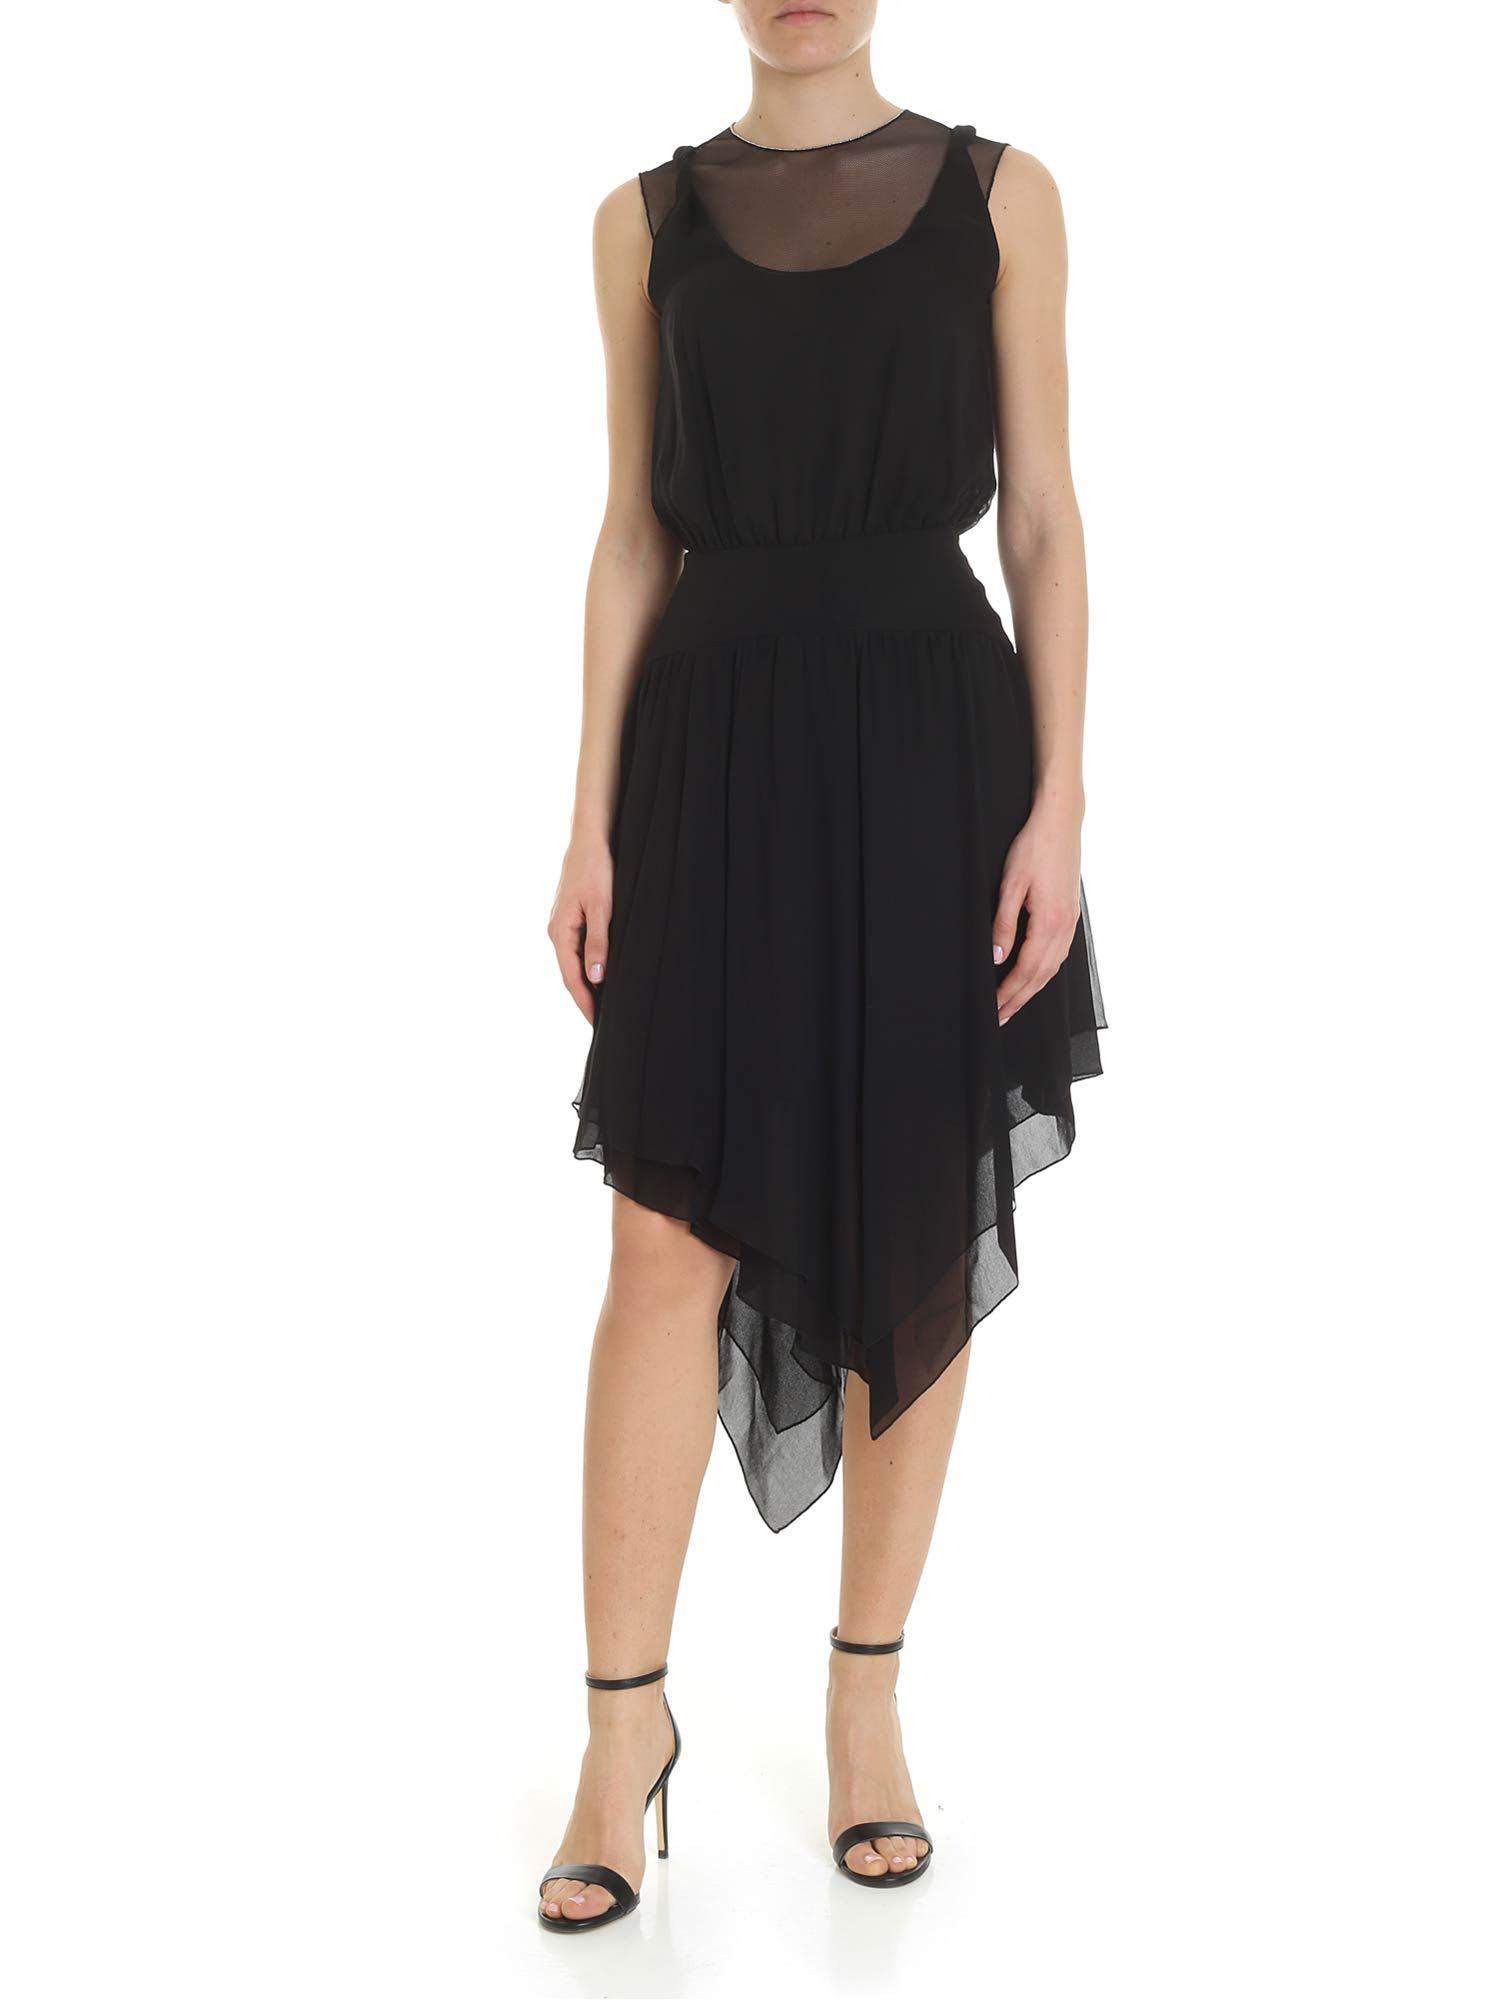 Karl Lagerfeld - Dress